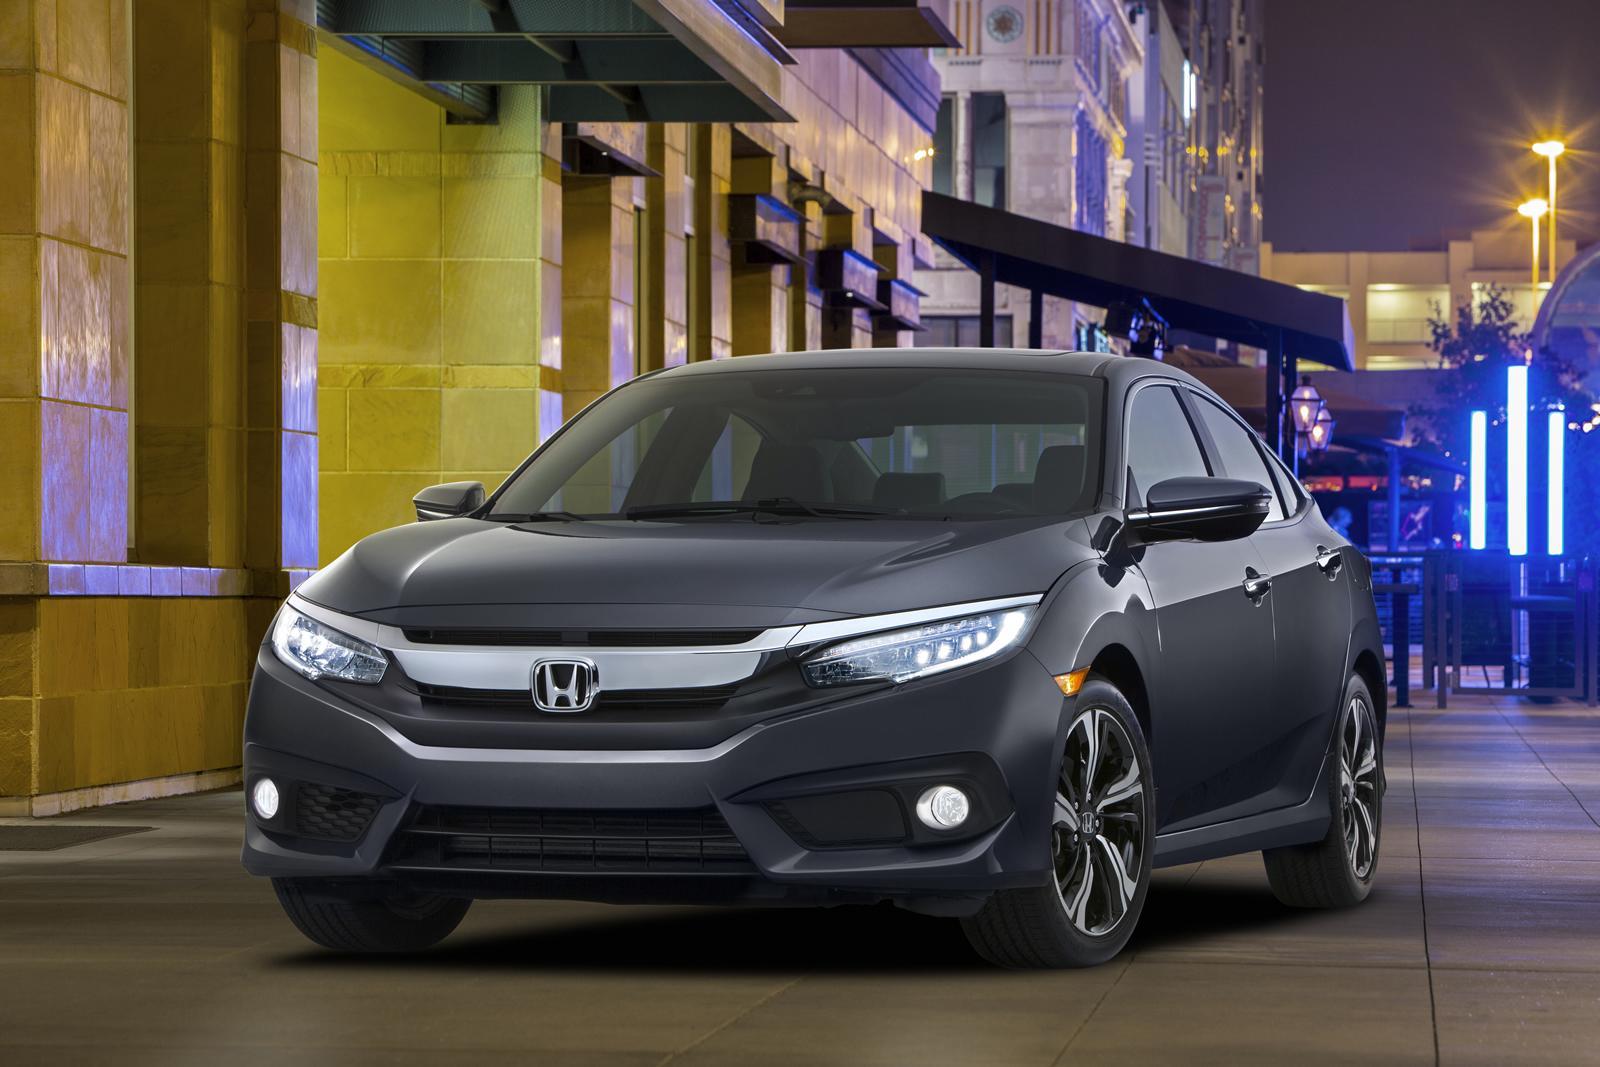 2016 Honda Civic Sedan Modeli